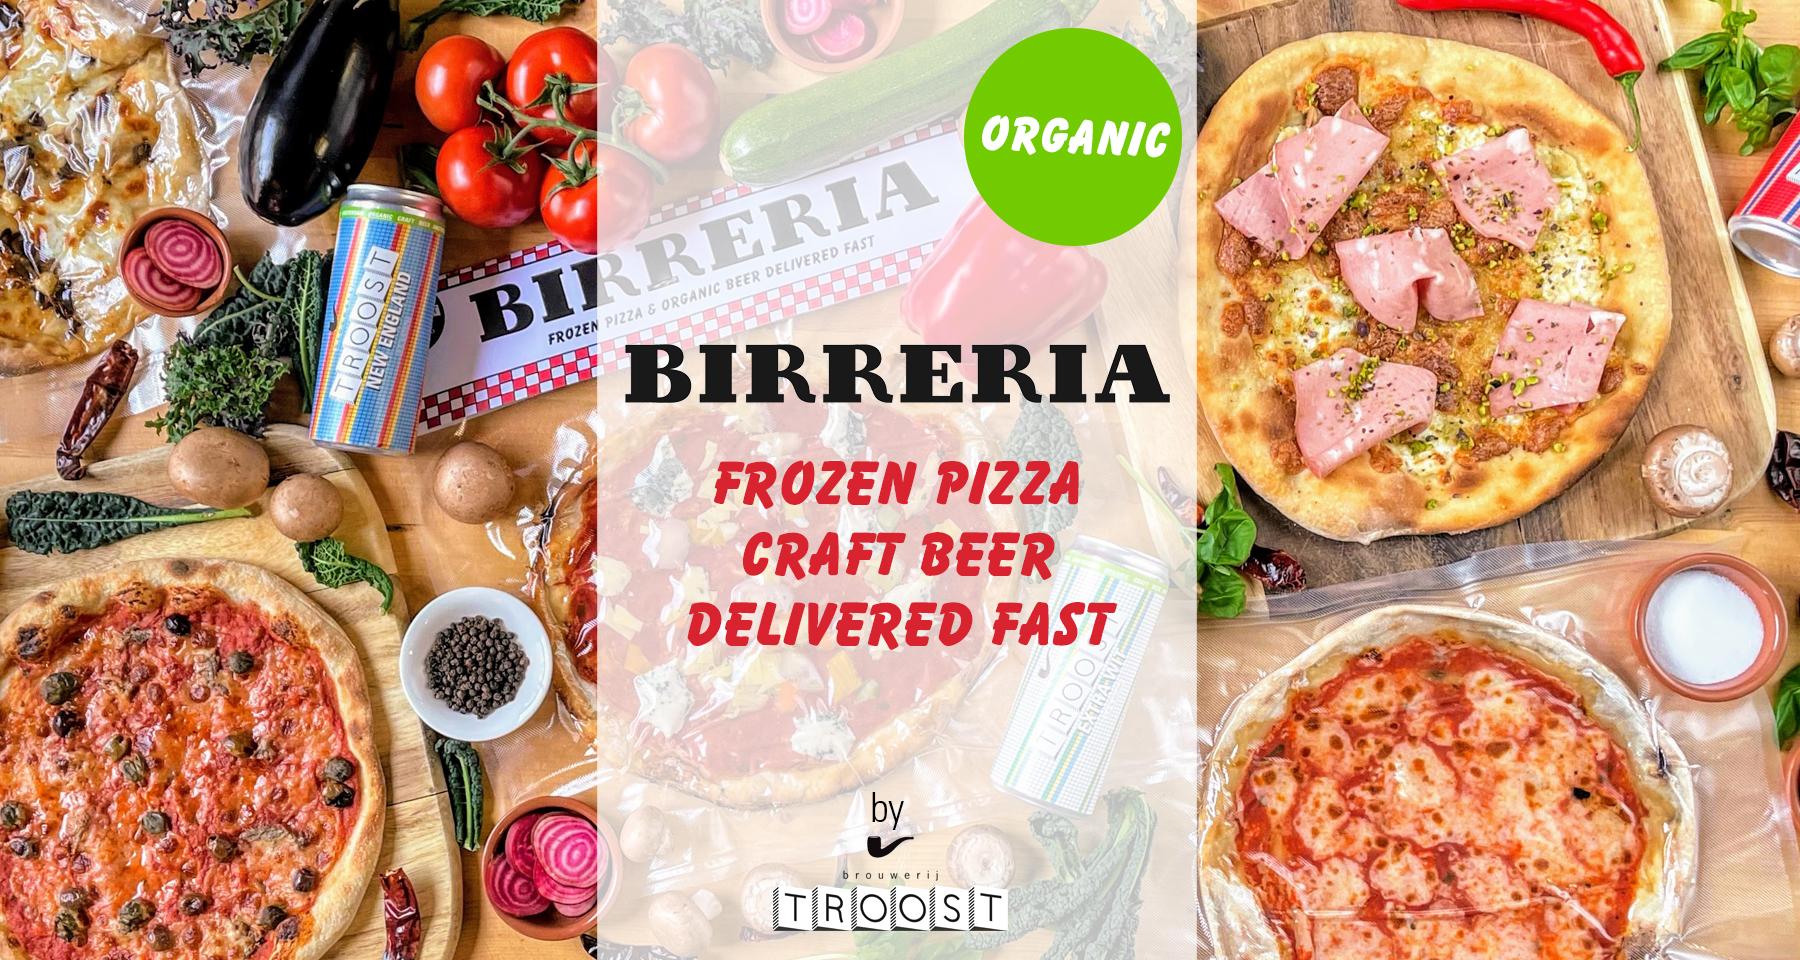 birreria, organic, frozen pizza, craft beer delivered fast